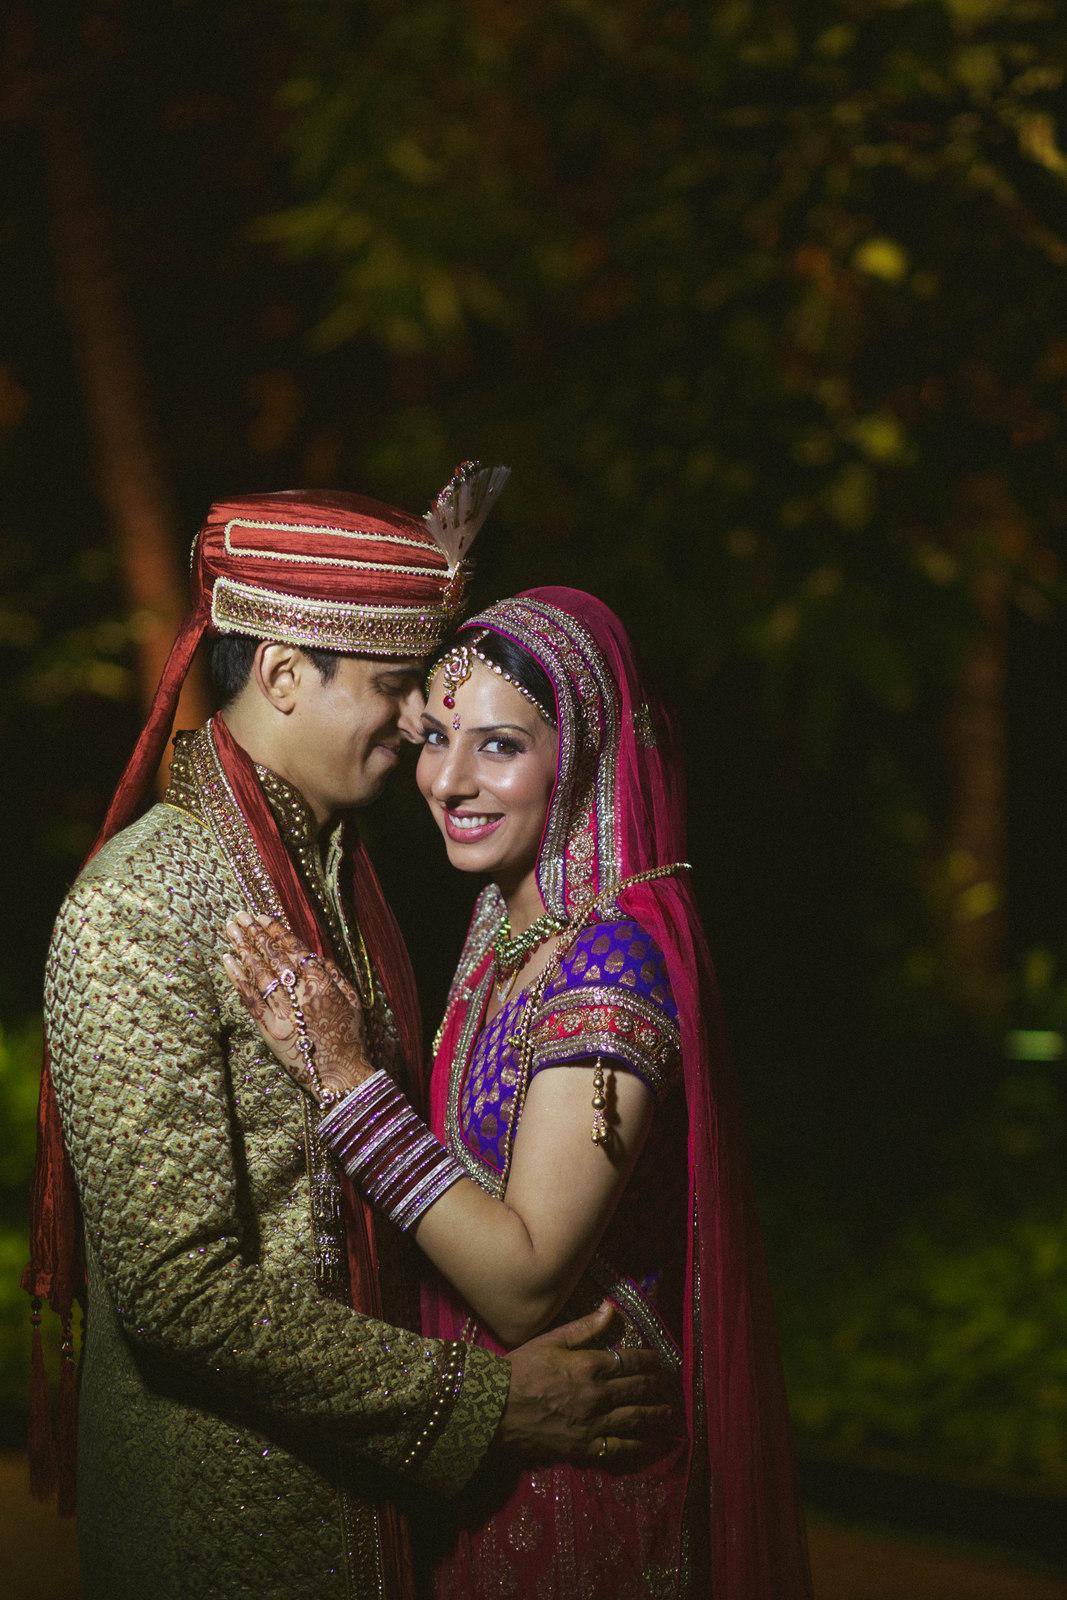 hindu-wedding-mumbai-into-candid-photography-dk-45.jpg